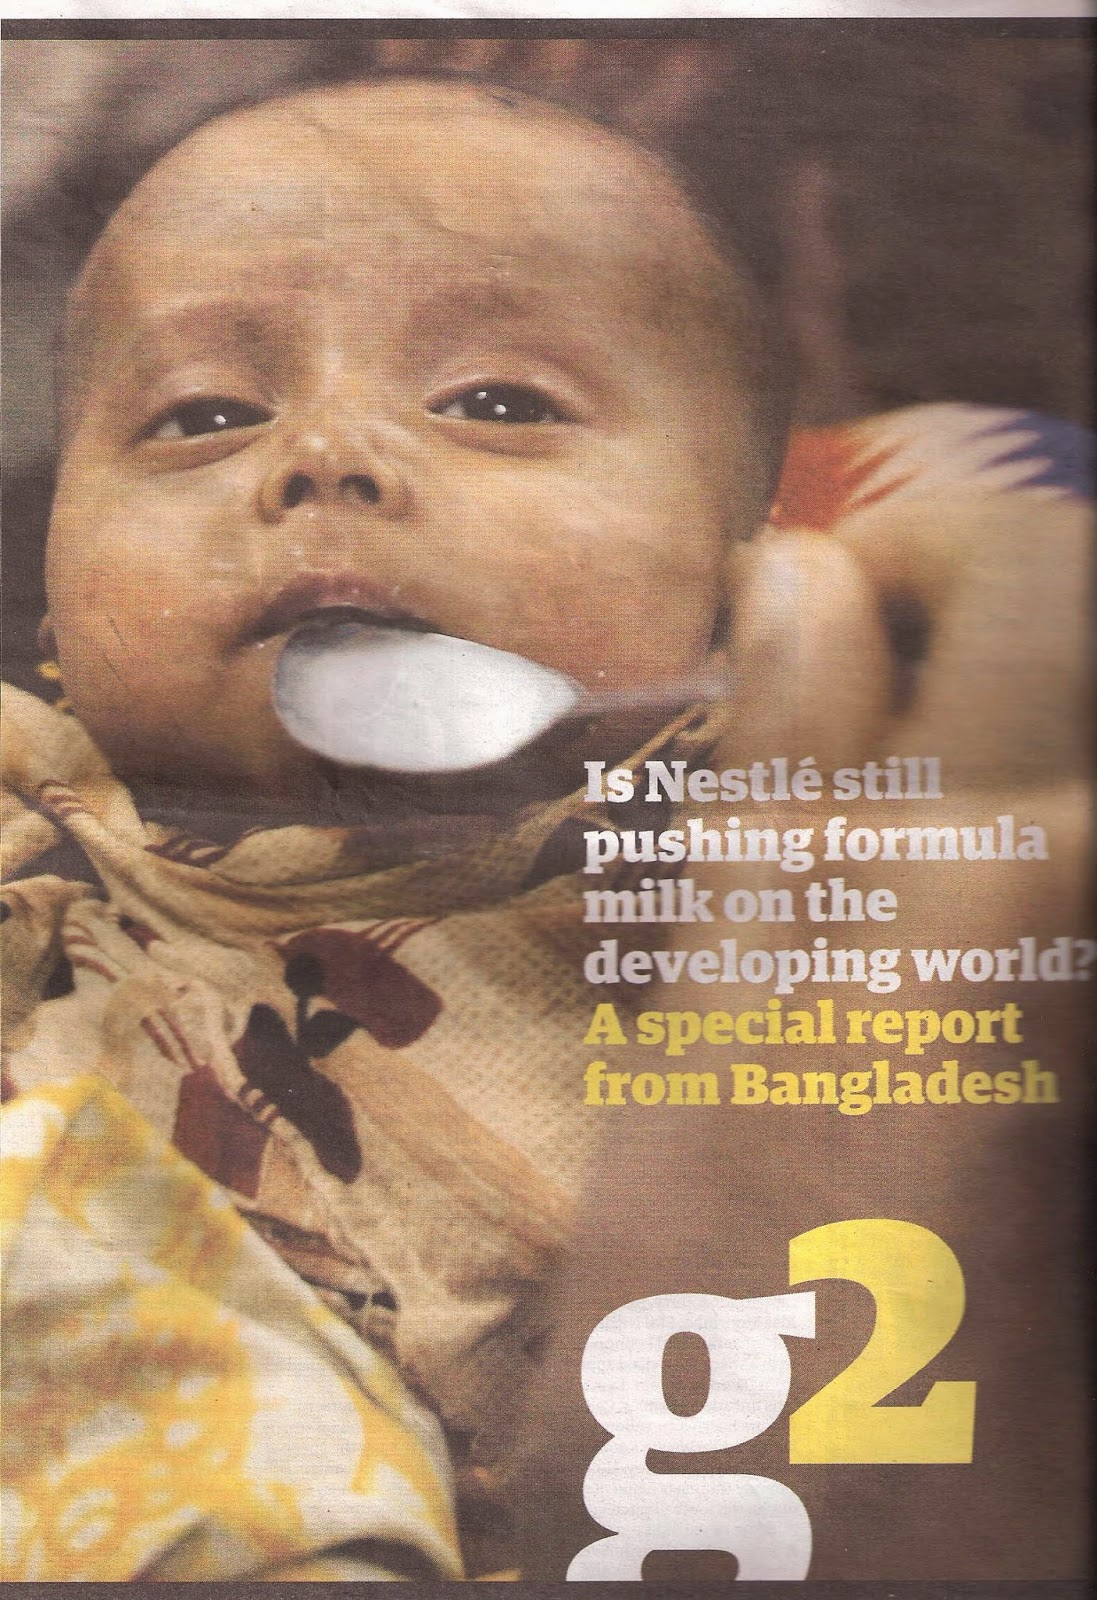 pr case study nestle baby formula scandal